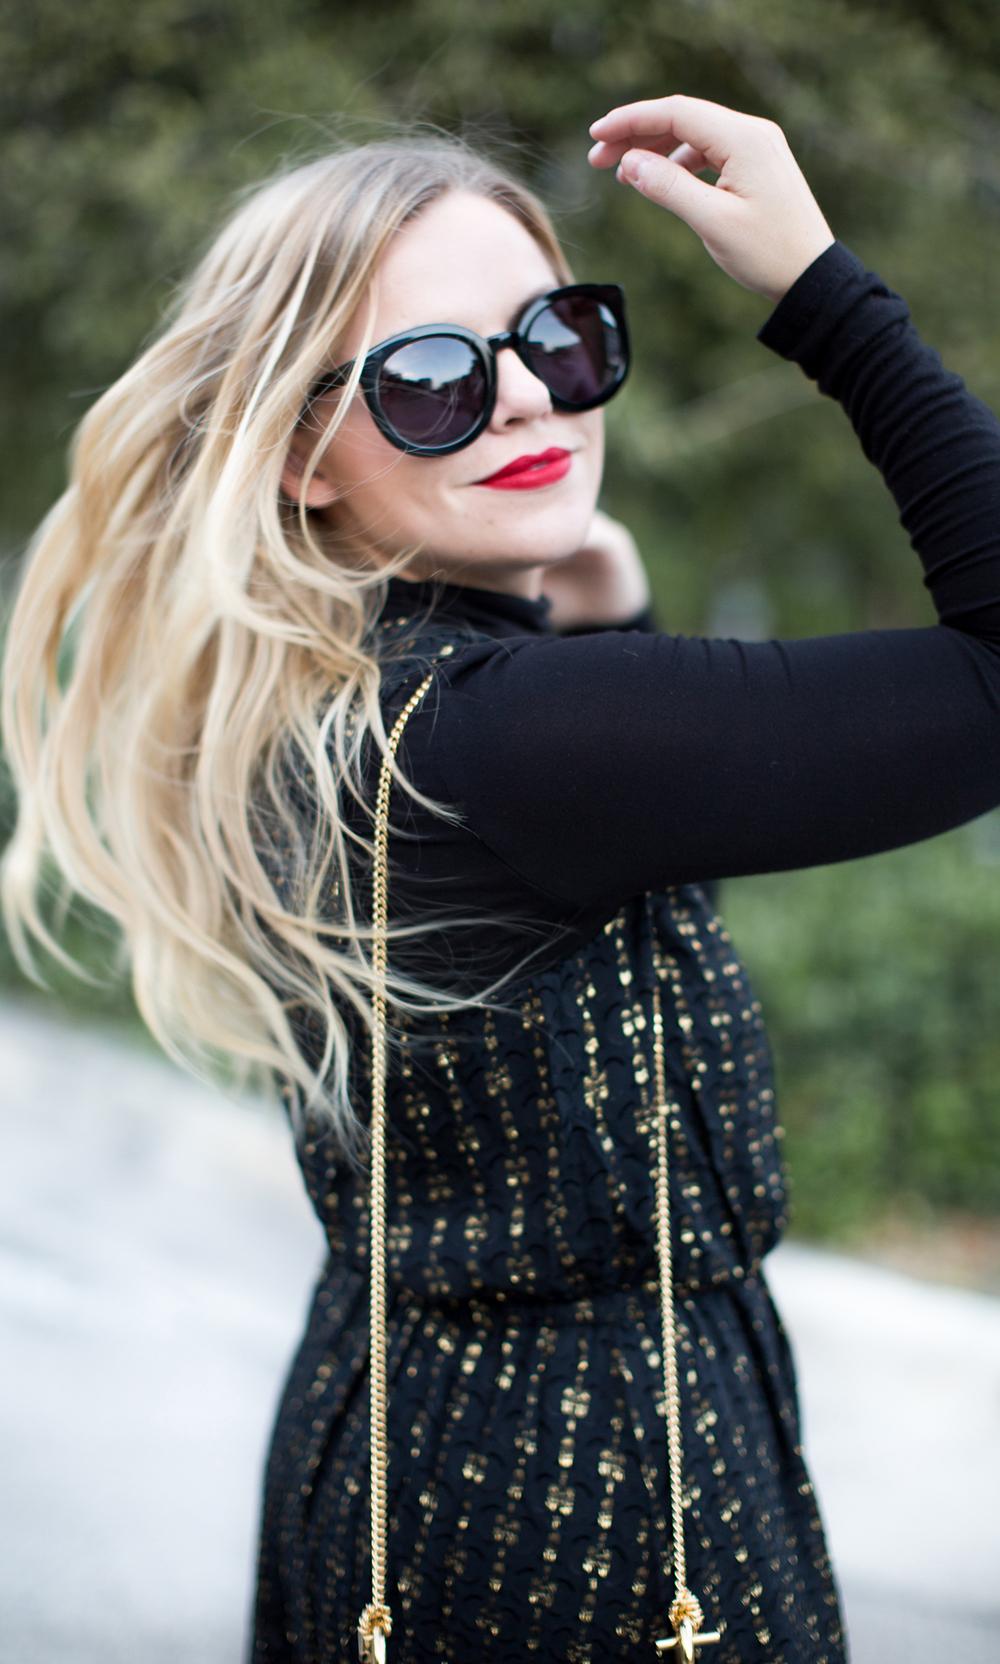 Black + Gold Metallic Dress